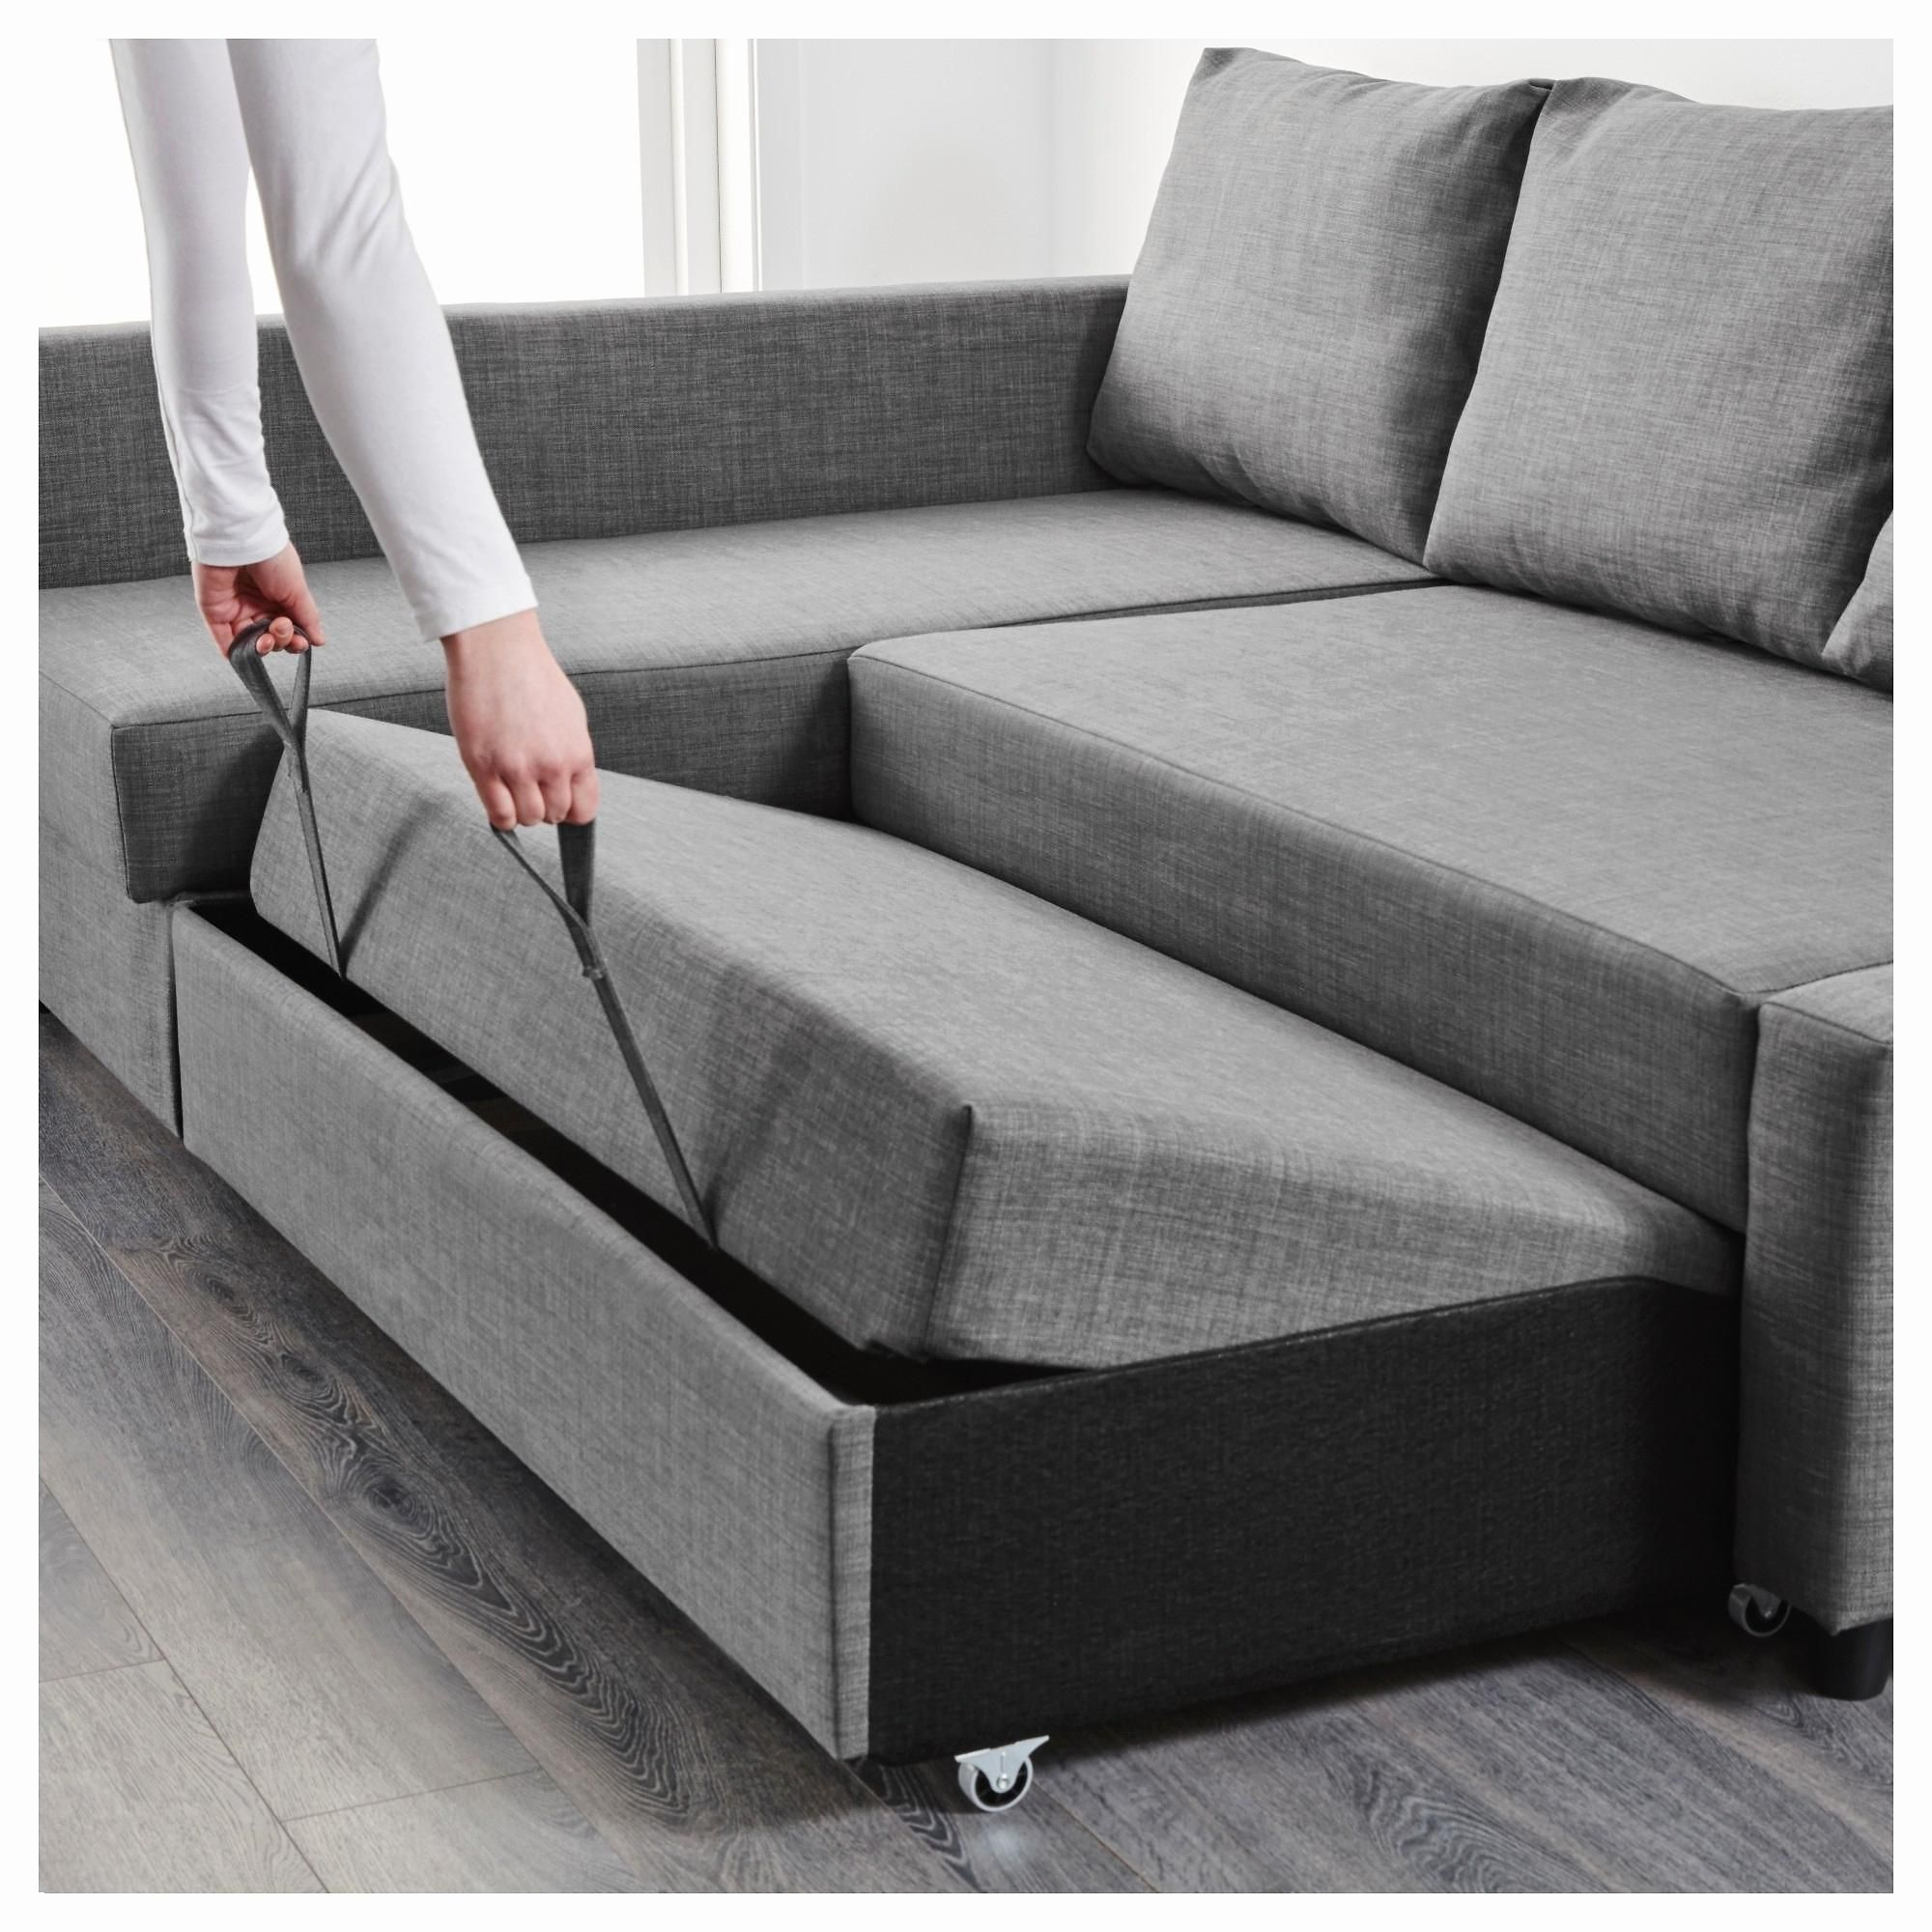 Unique West Elm Futon   Sofa bed with chaise, Sofa bed ...